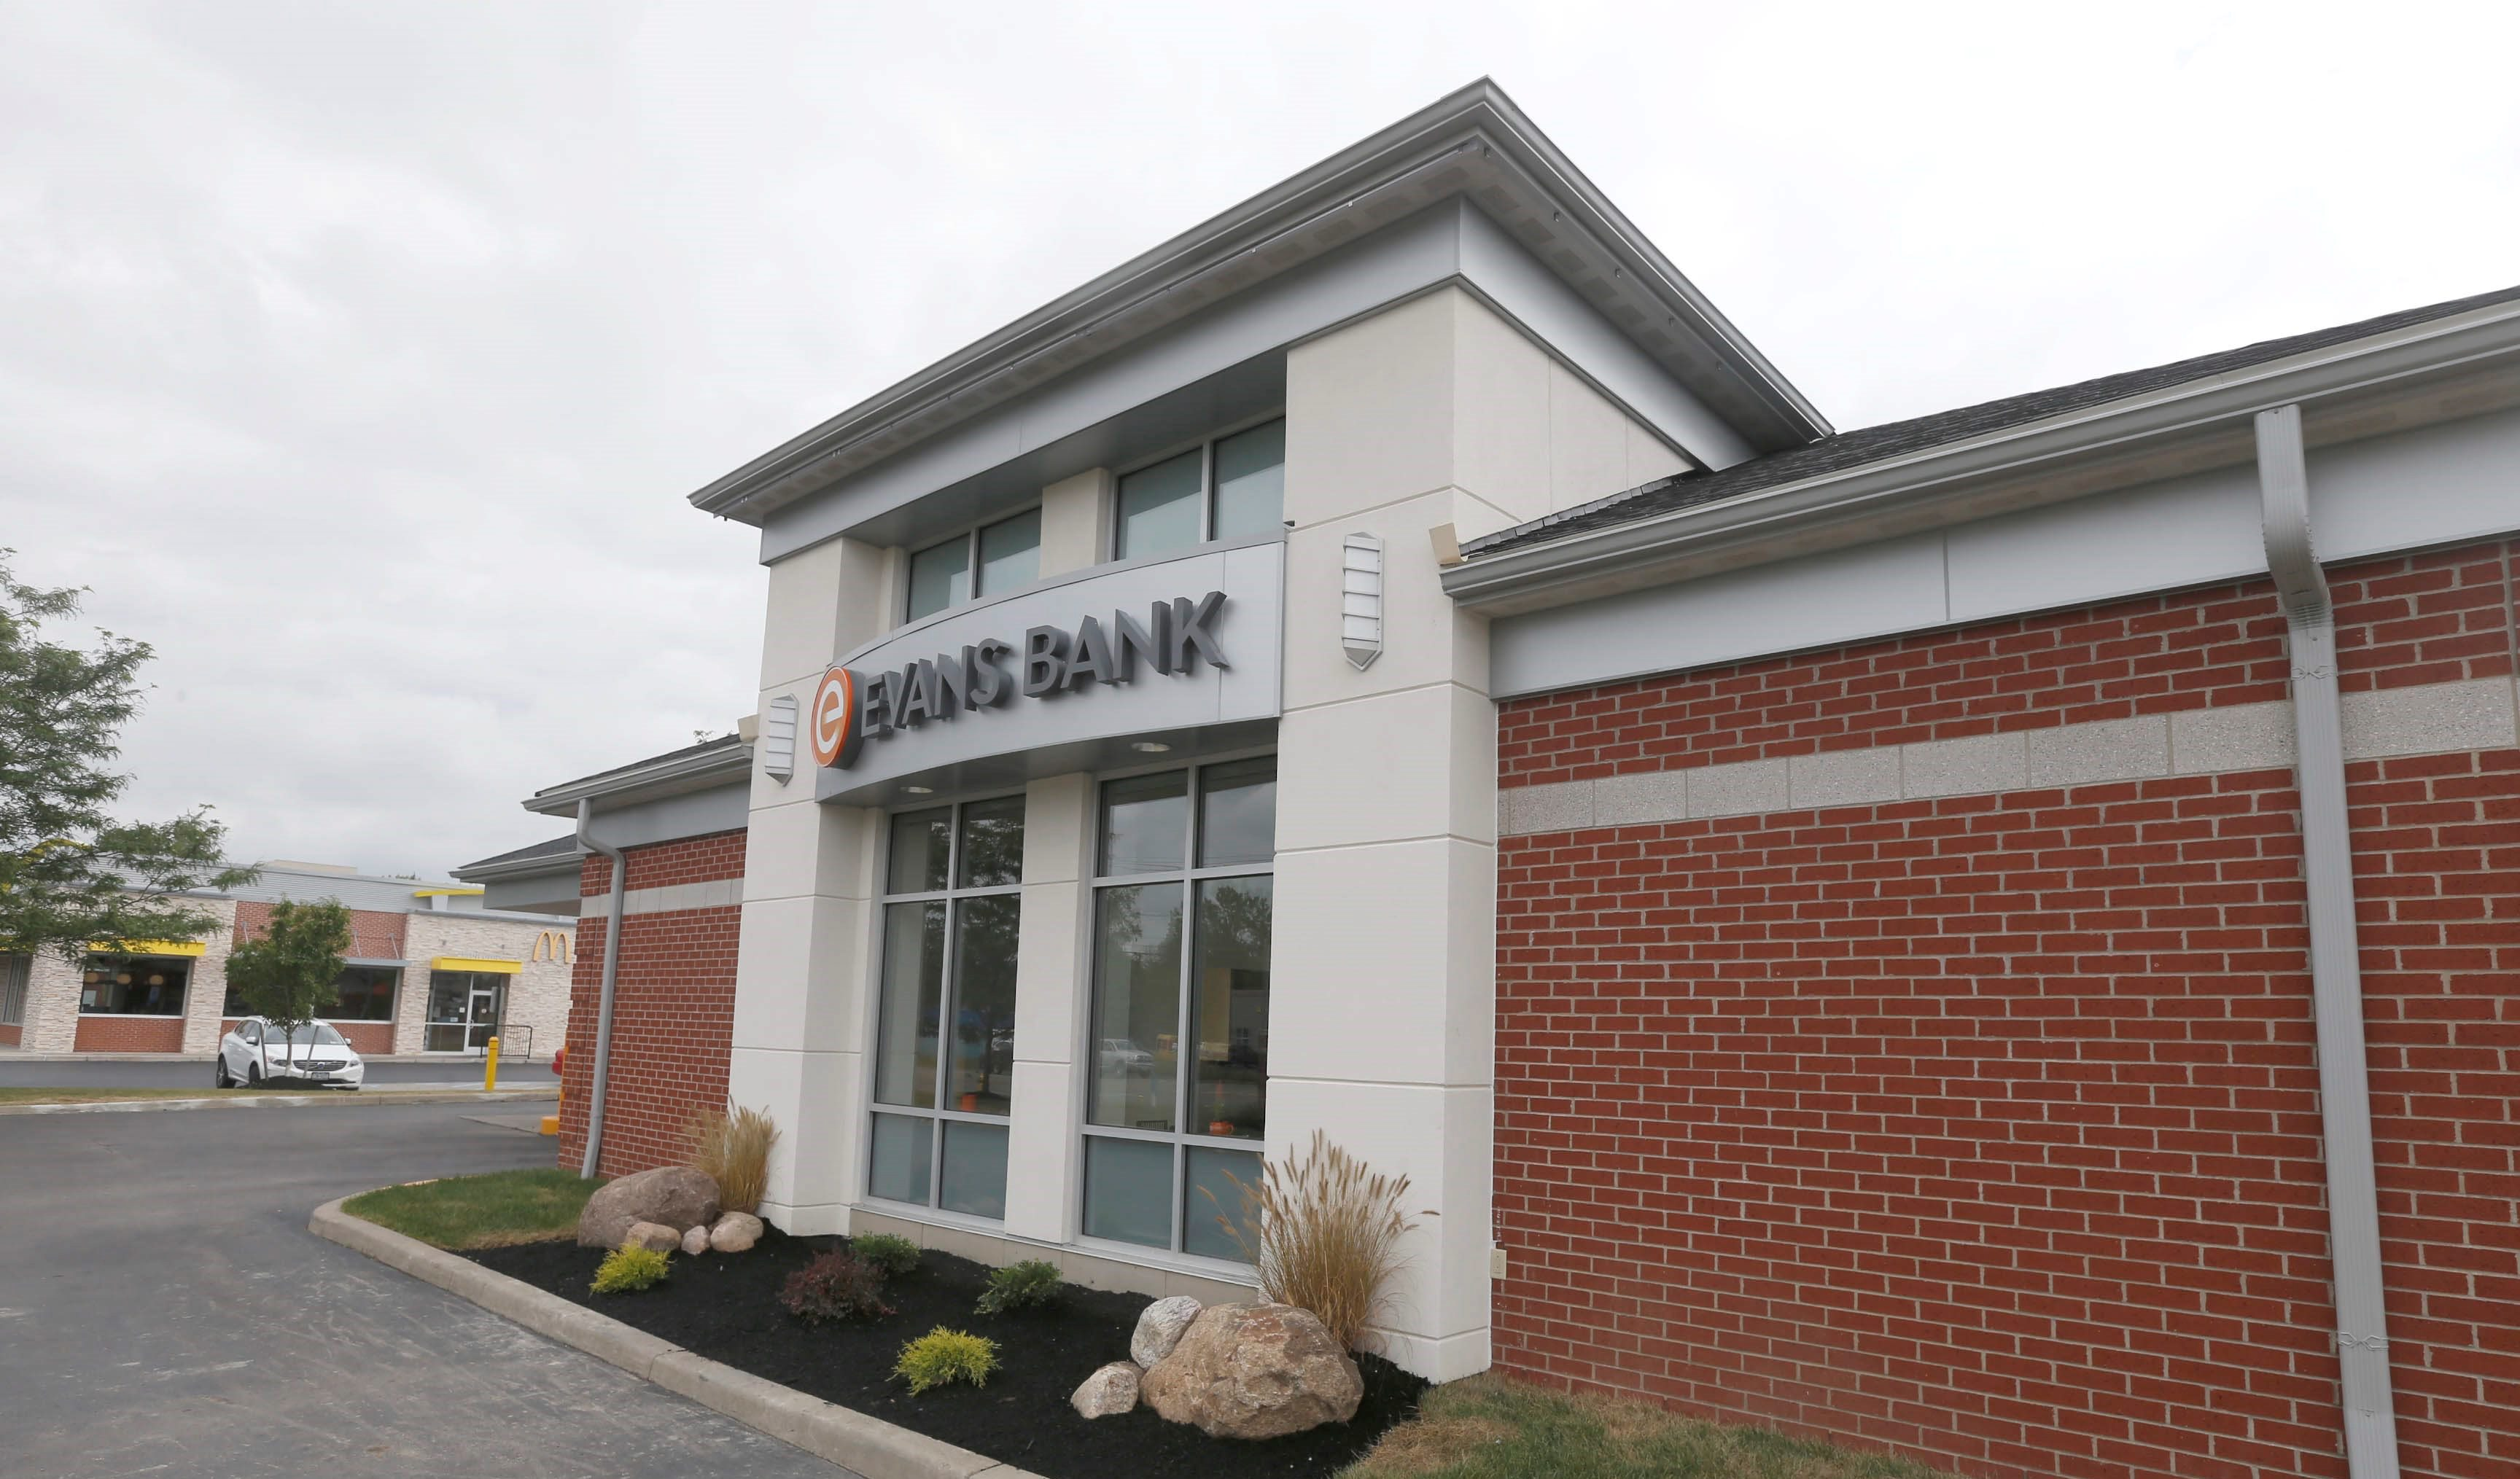 An Evans Bank location on Transit Road in Depew. (Robert Kirkham/Buffalo News)